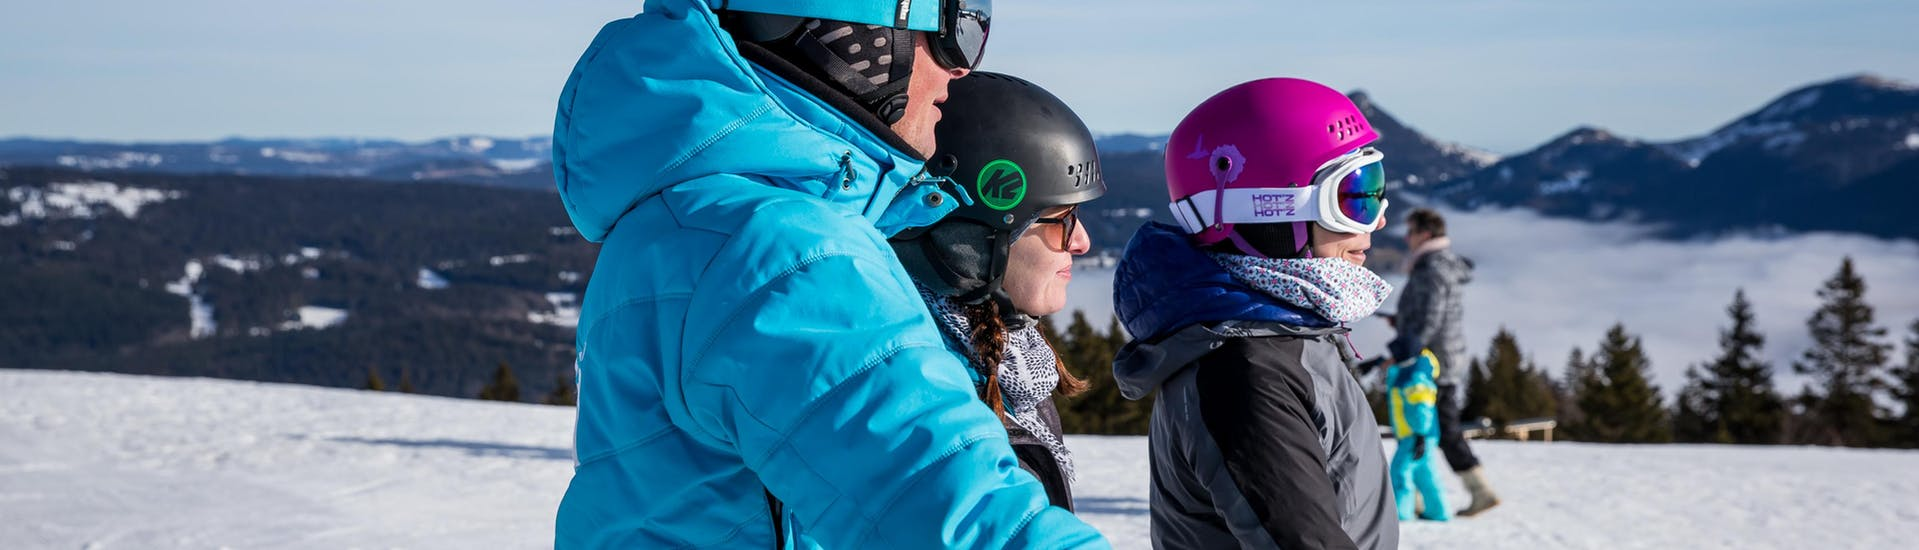 Cours de ski Ados (13-15 ans) - Vacances - A.-midi - Arc1800